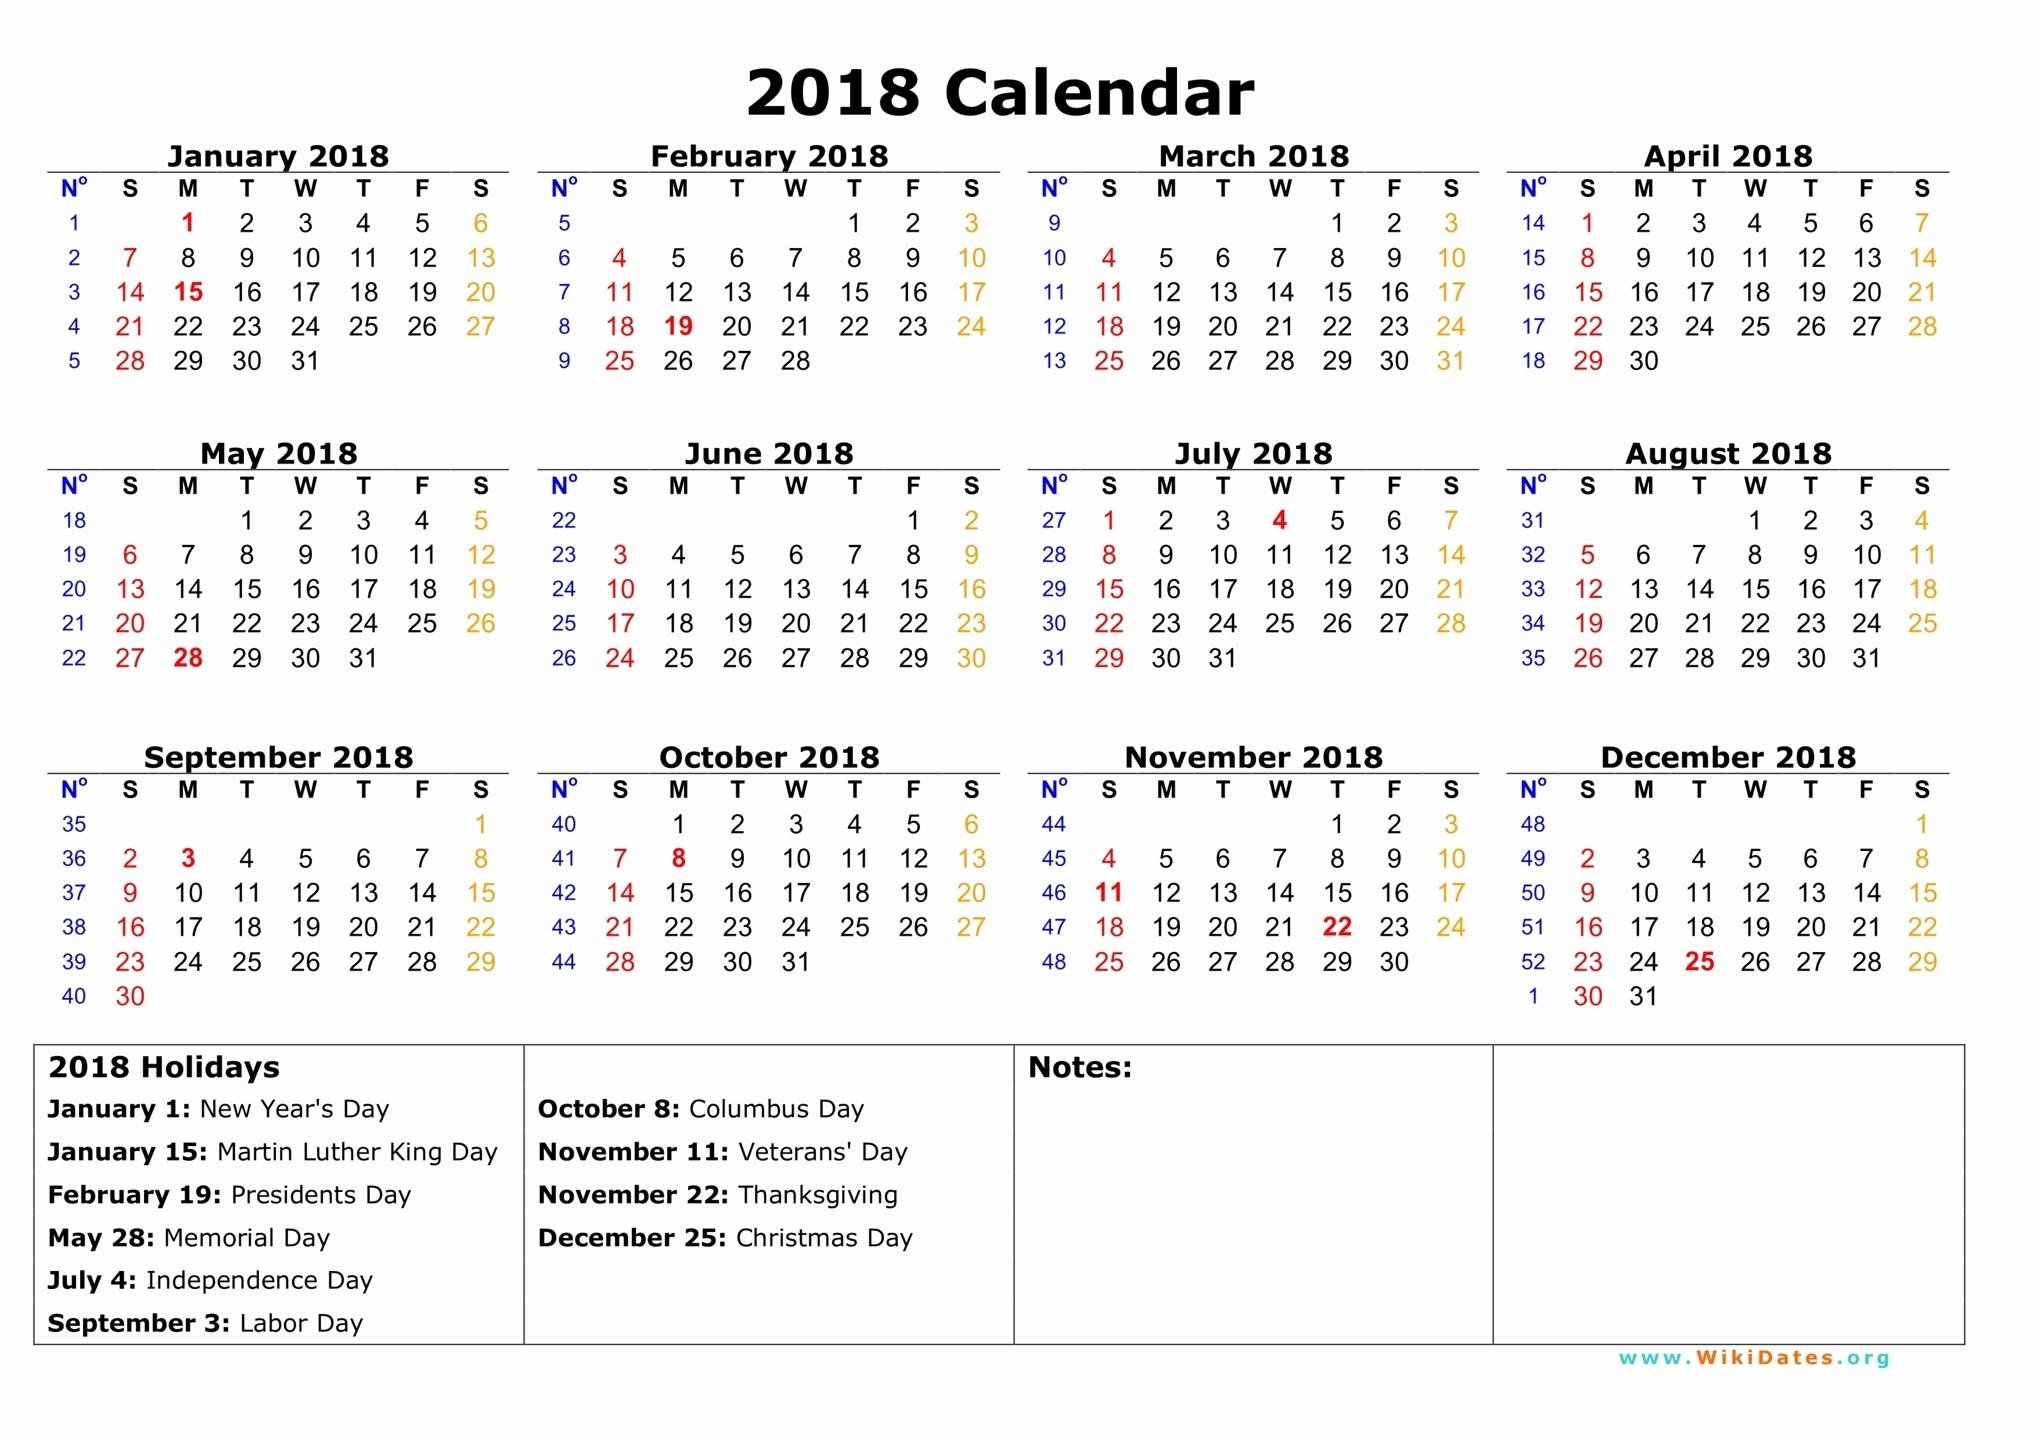 Calendar 2018 Printable with Holidays Inspirational January 2018 Calendar Printable with Holidays